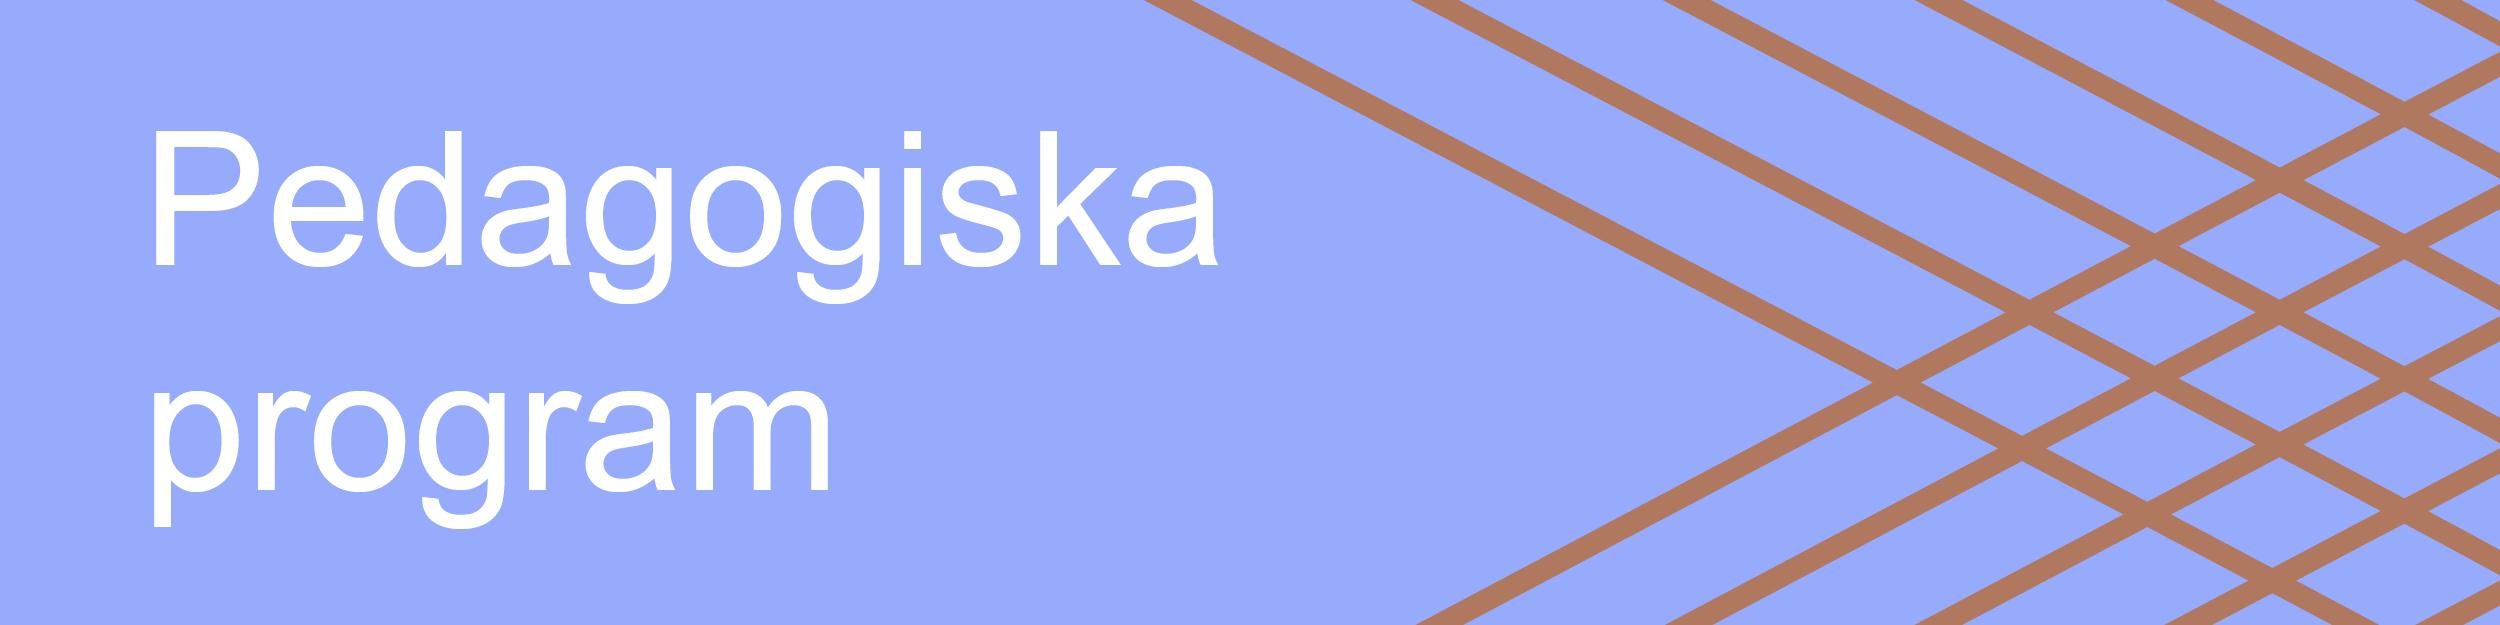 ymd_pedagosgiska-program